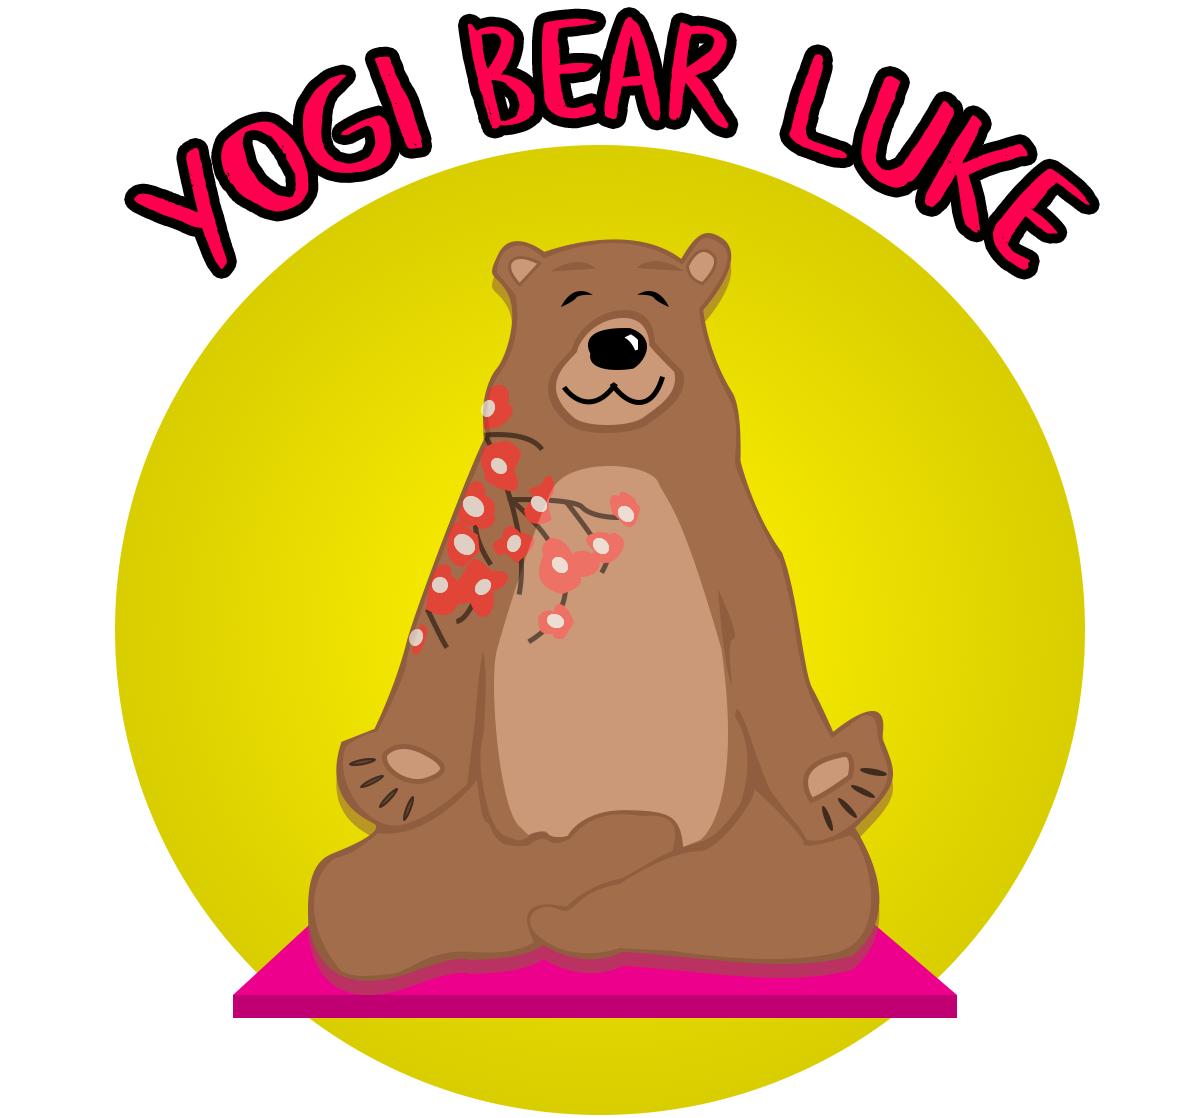 Yogi bear luke.png